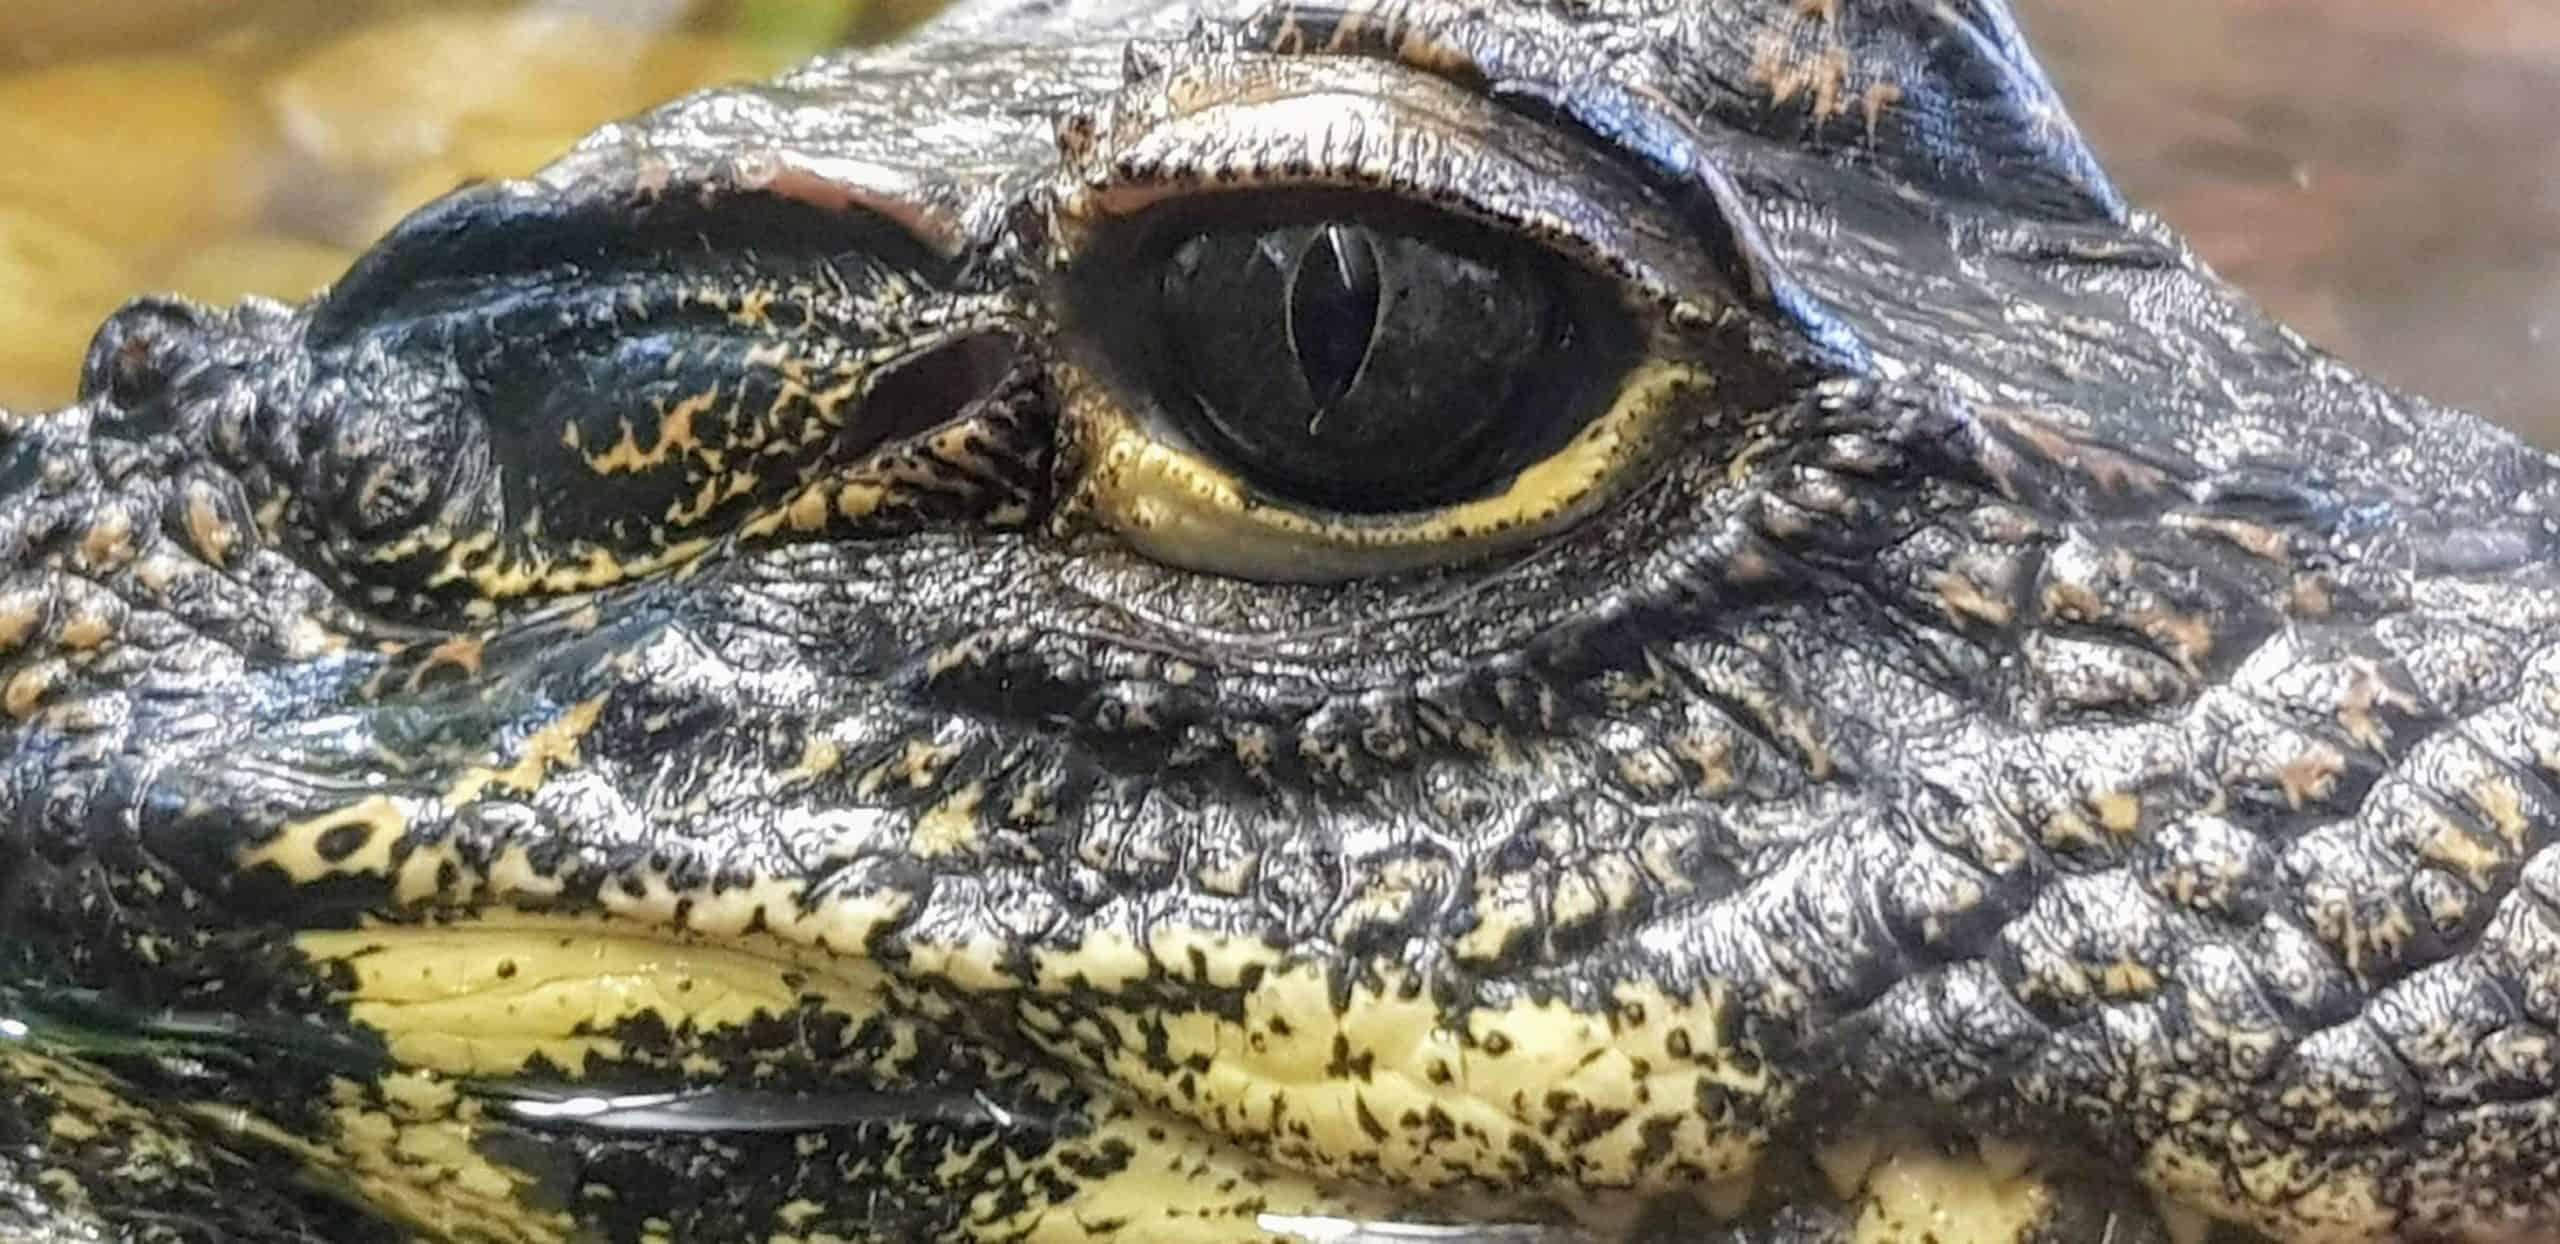 Krokodil im Ausflugsziel Reptilienzoo Happ in Klagenfurt am Wörthersee in Kärnten - Nahaufnahme Auge